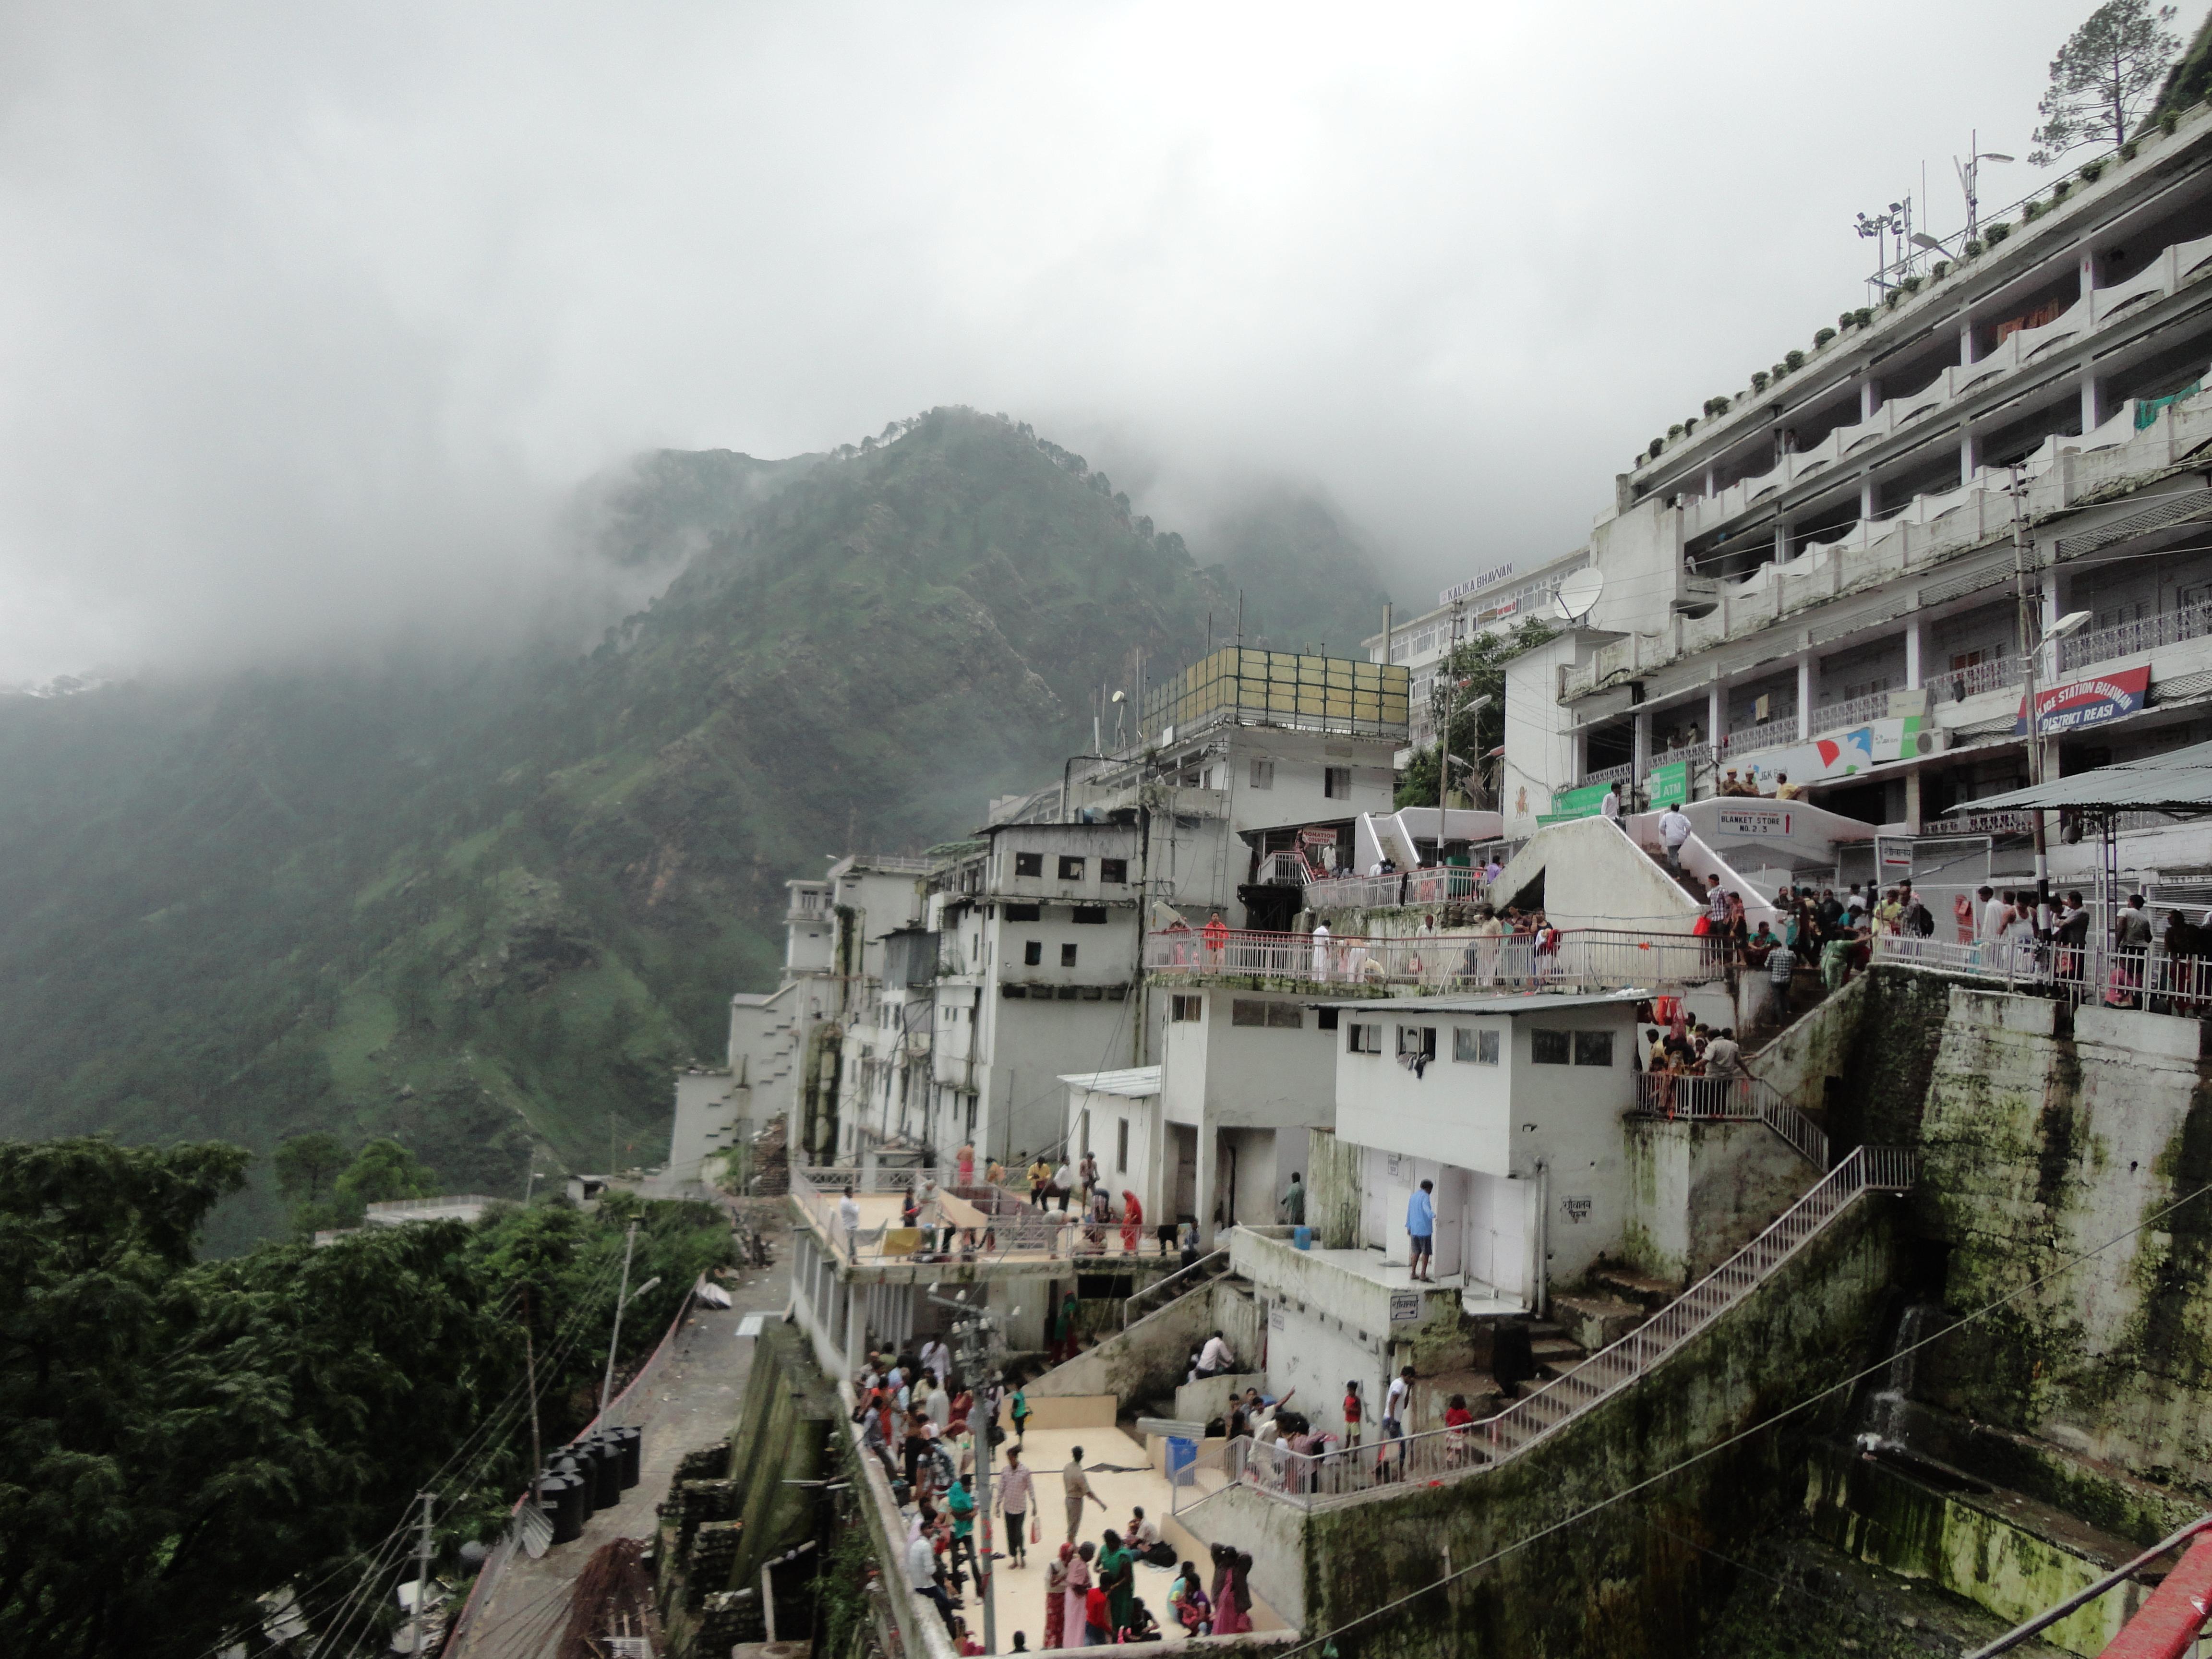 Jai Mata Di Hd Wallpaper Vaishno Devi Weather Gt Best Time To Visit Temperature